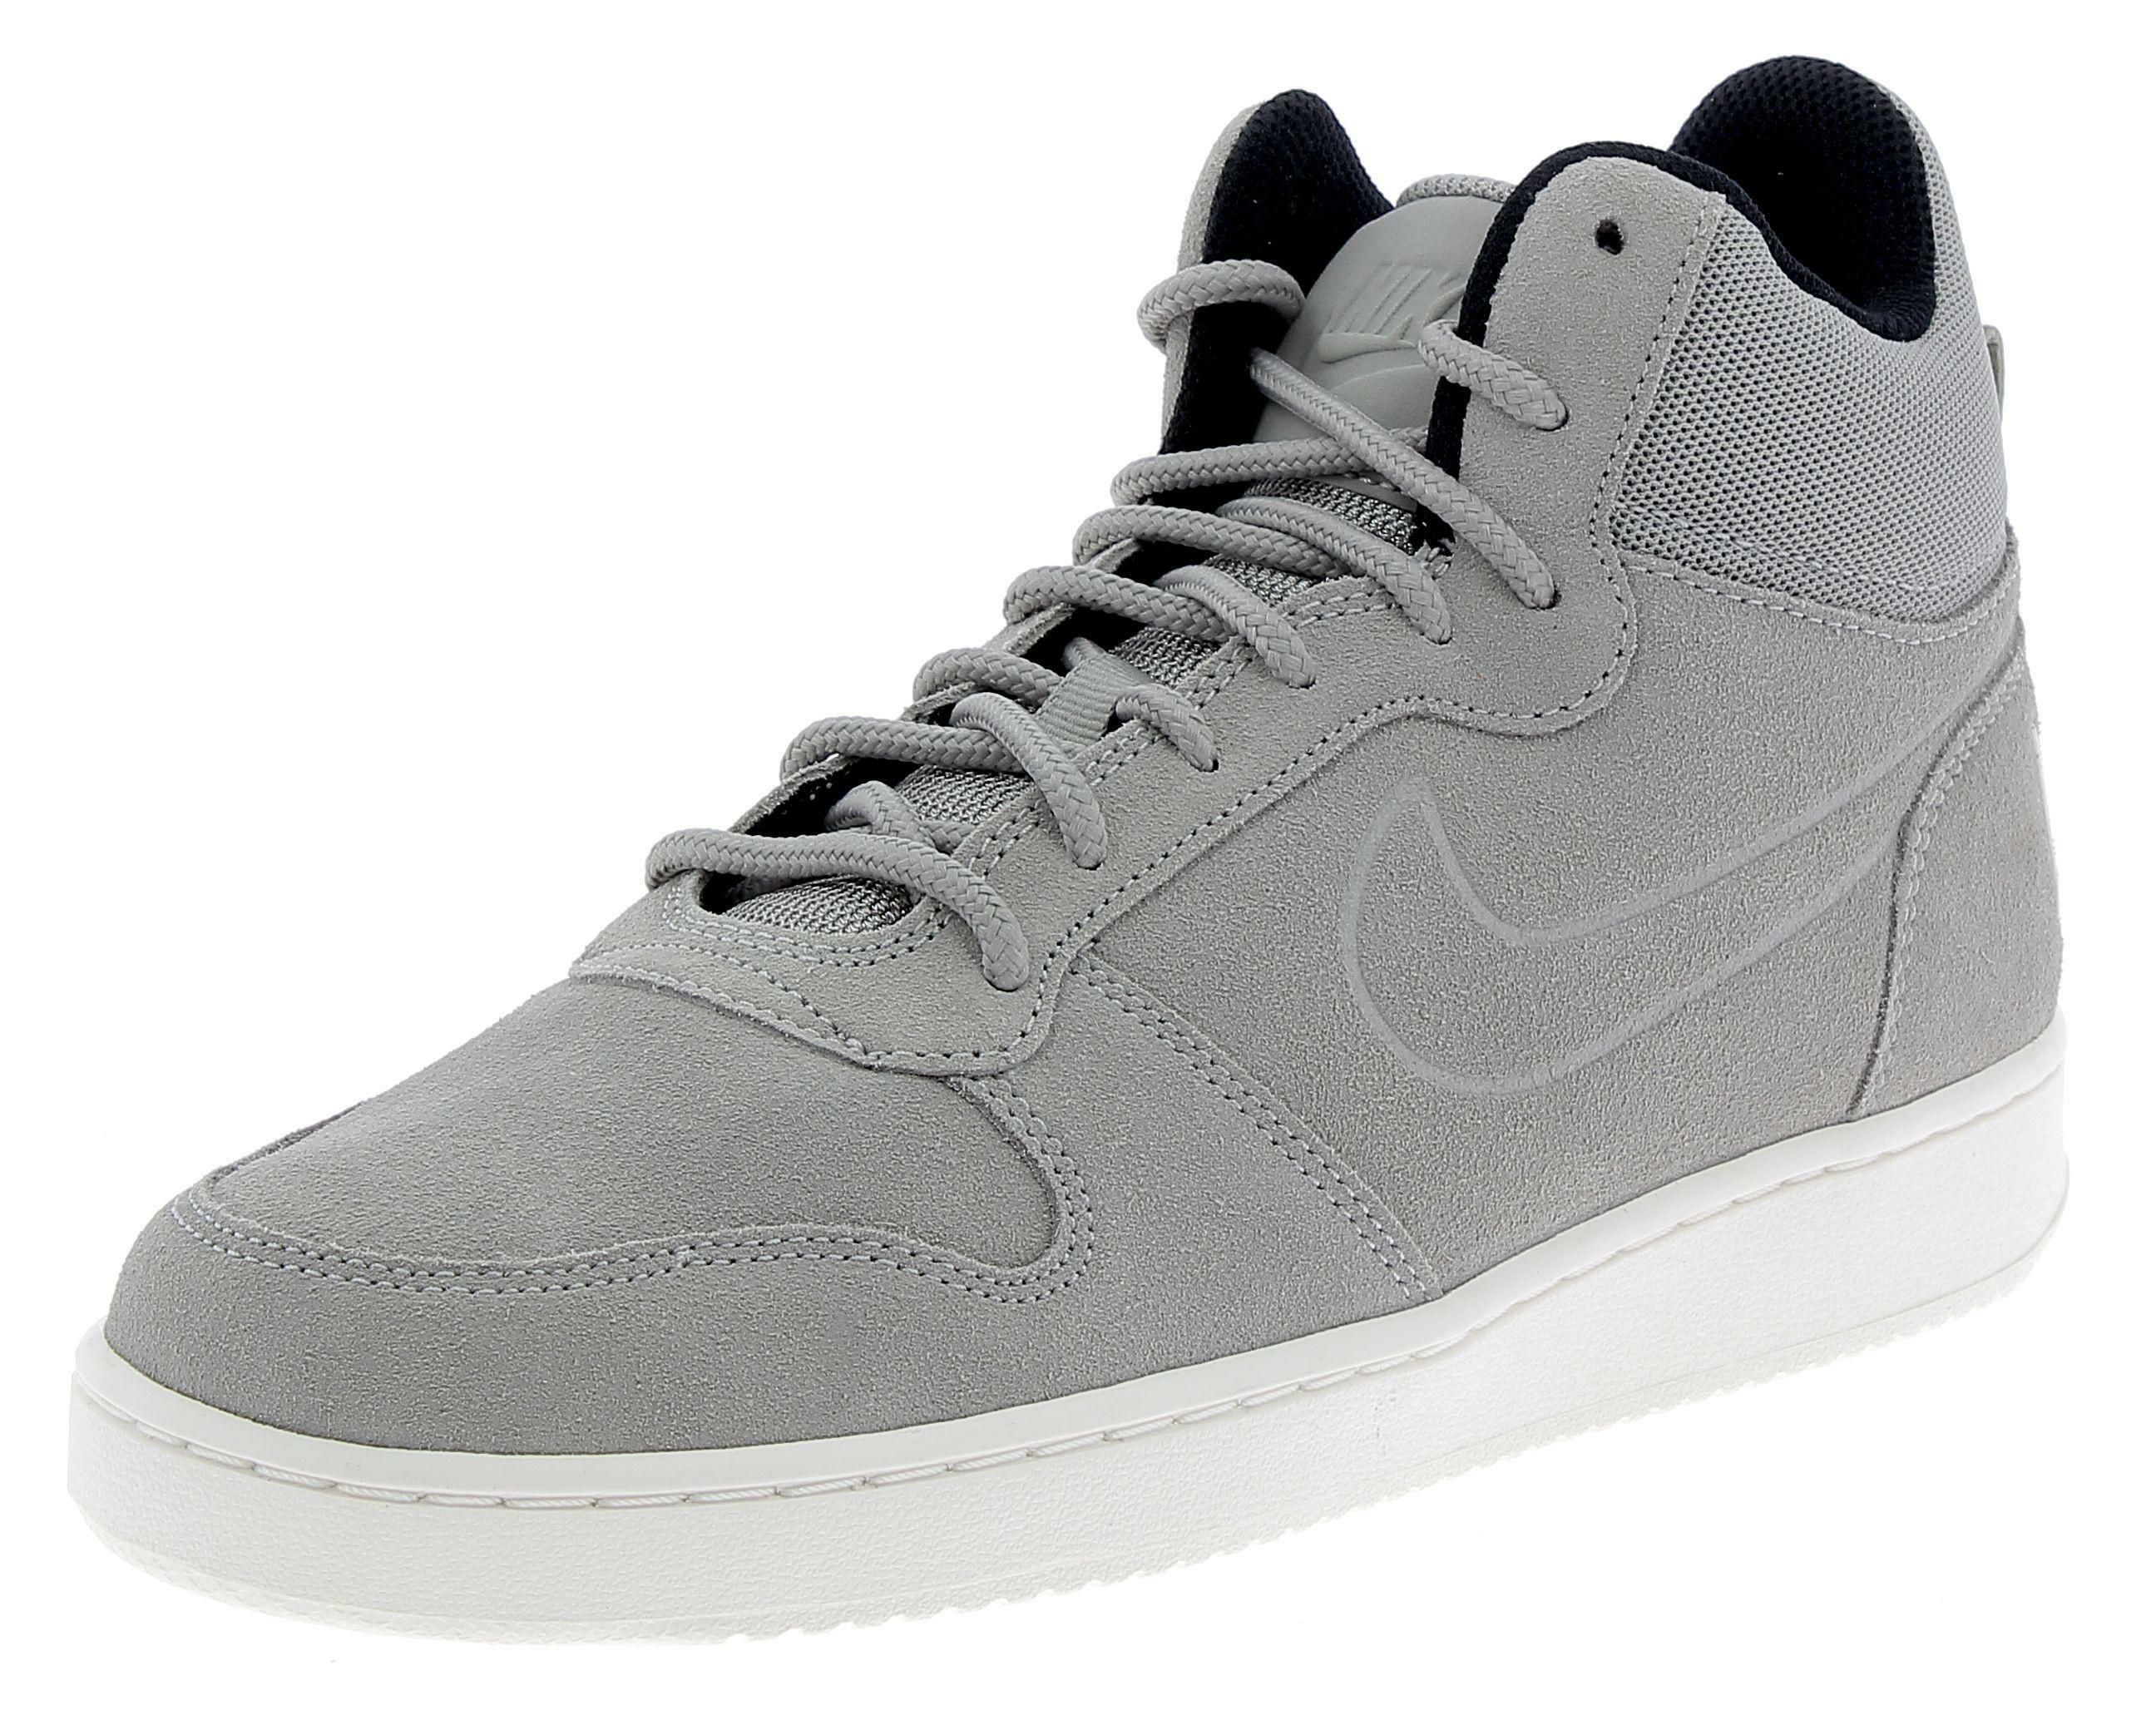 Court Prem Scarpe Mid Borough Beige Nike Sportive v80OmNynw